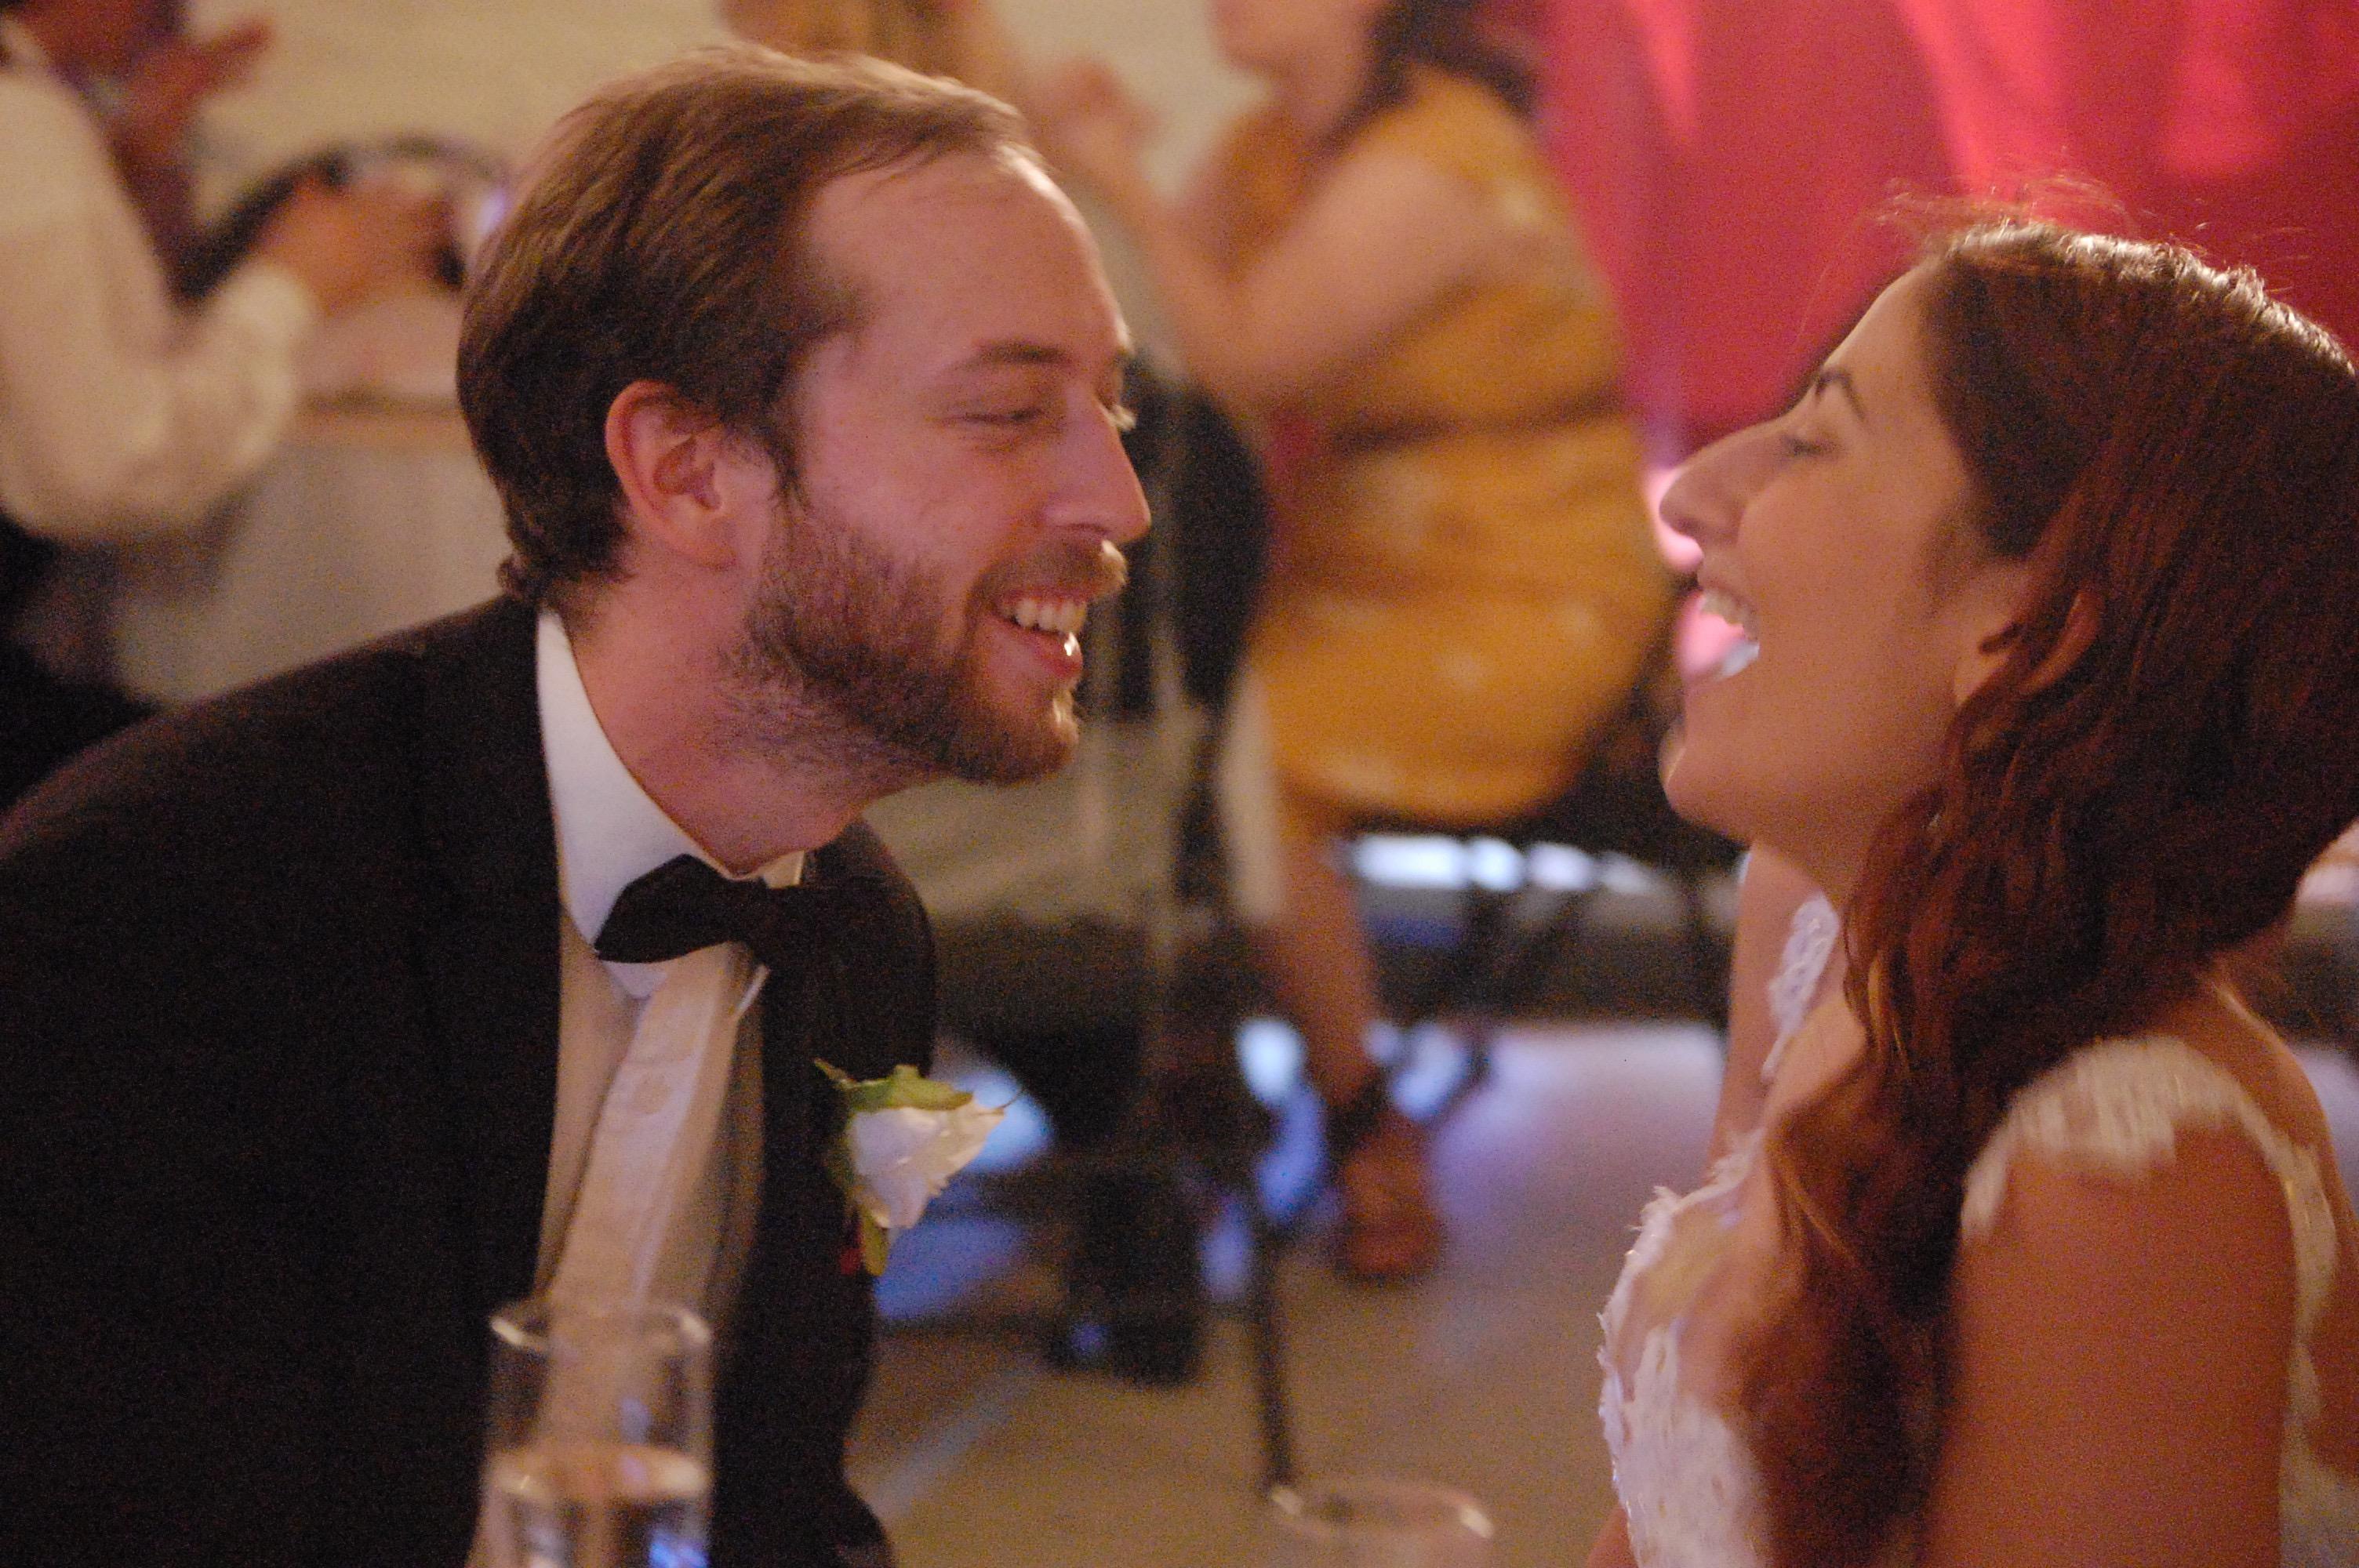 Peter & Angelica Smiling (Bride & Groom)